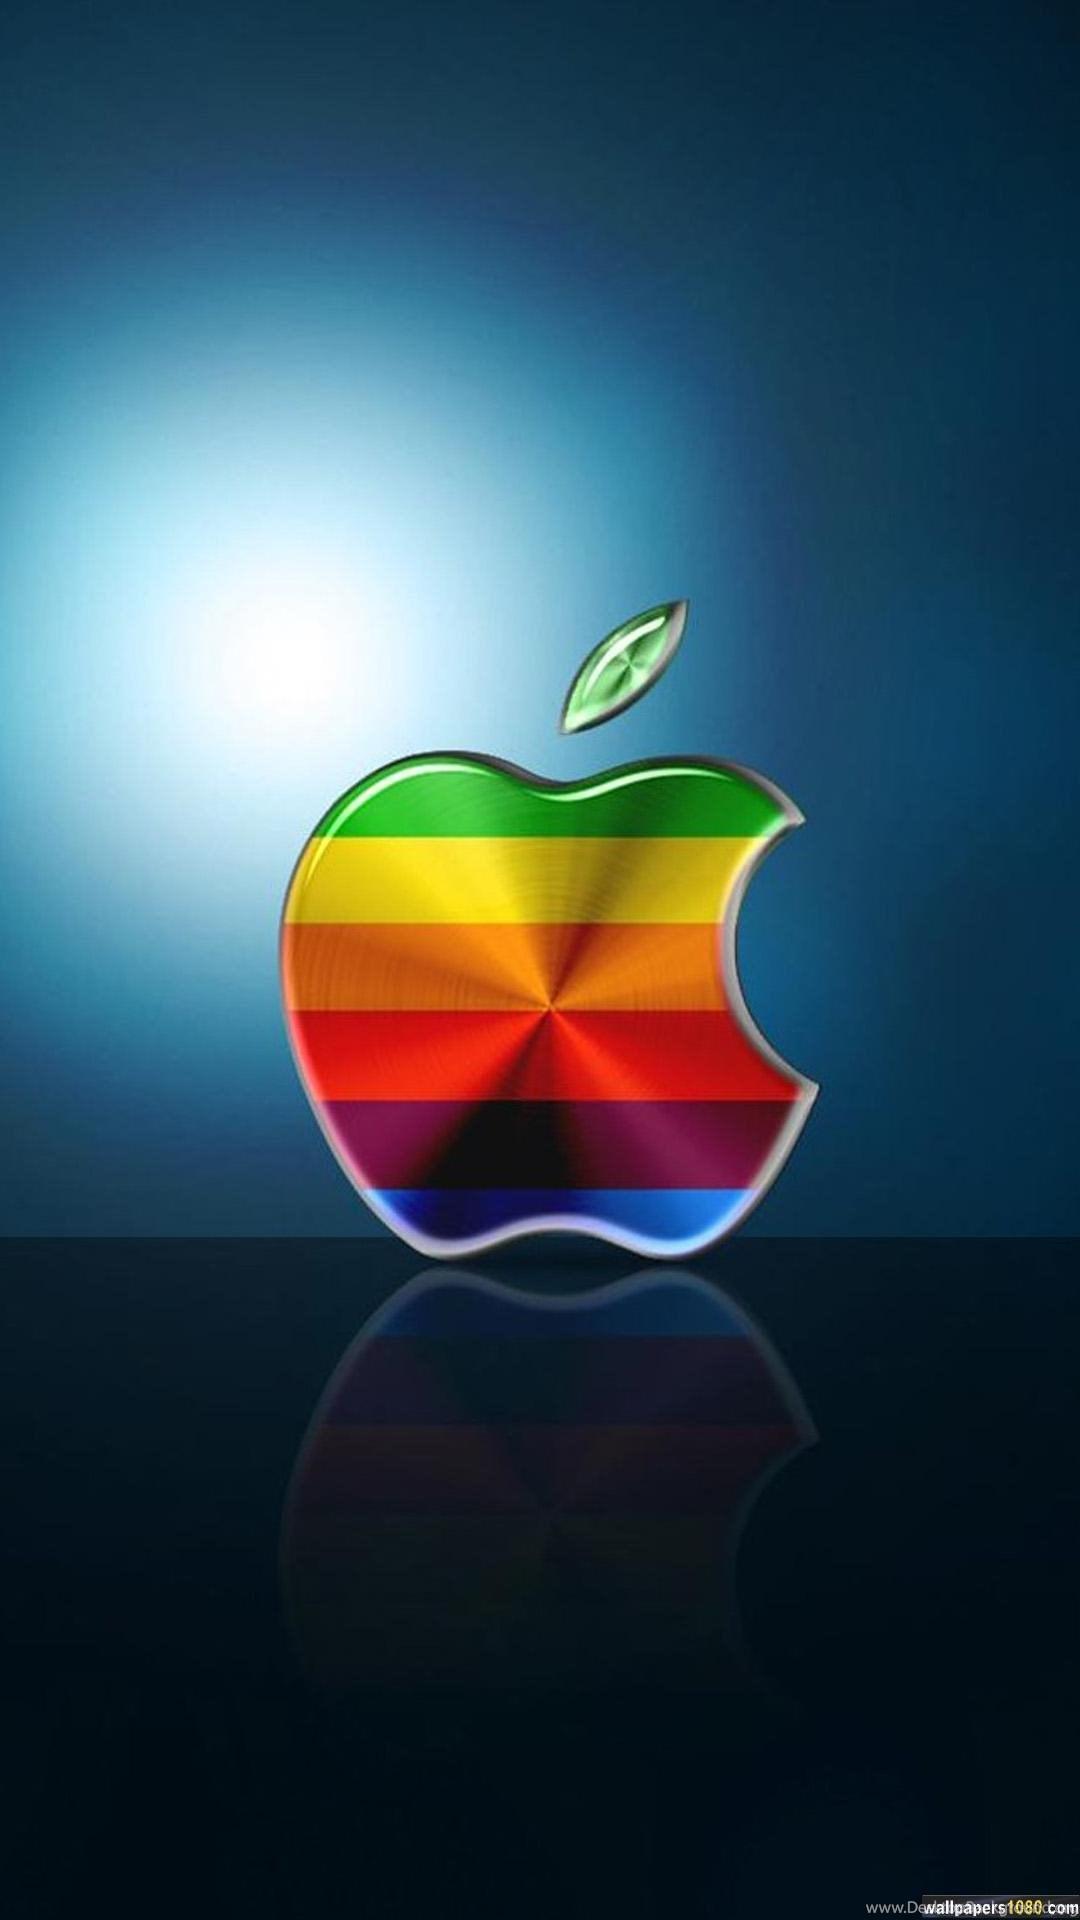 Apple Iphone 6 Plus Wallpapers 39 Desktop Background